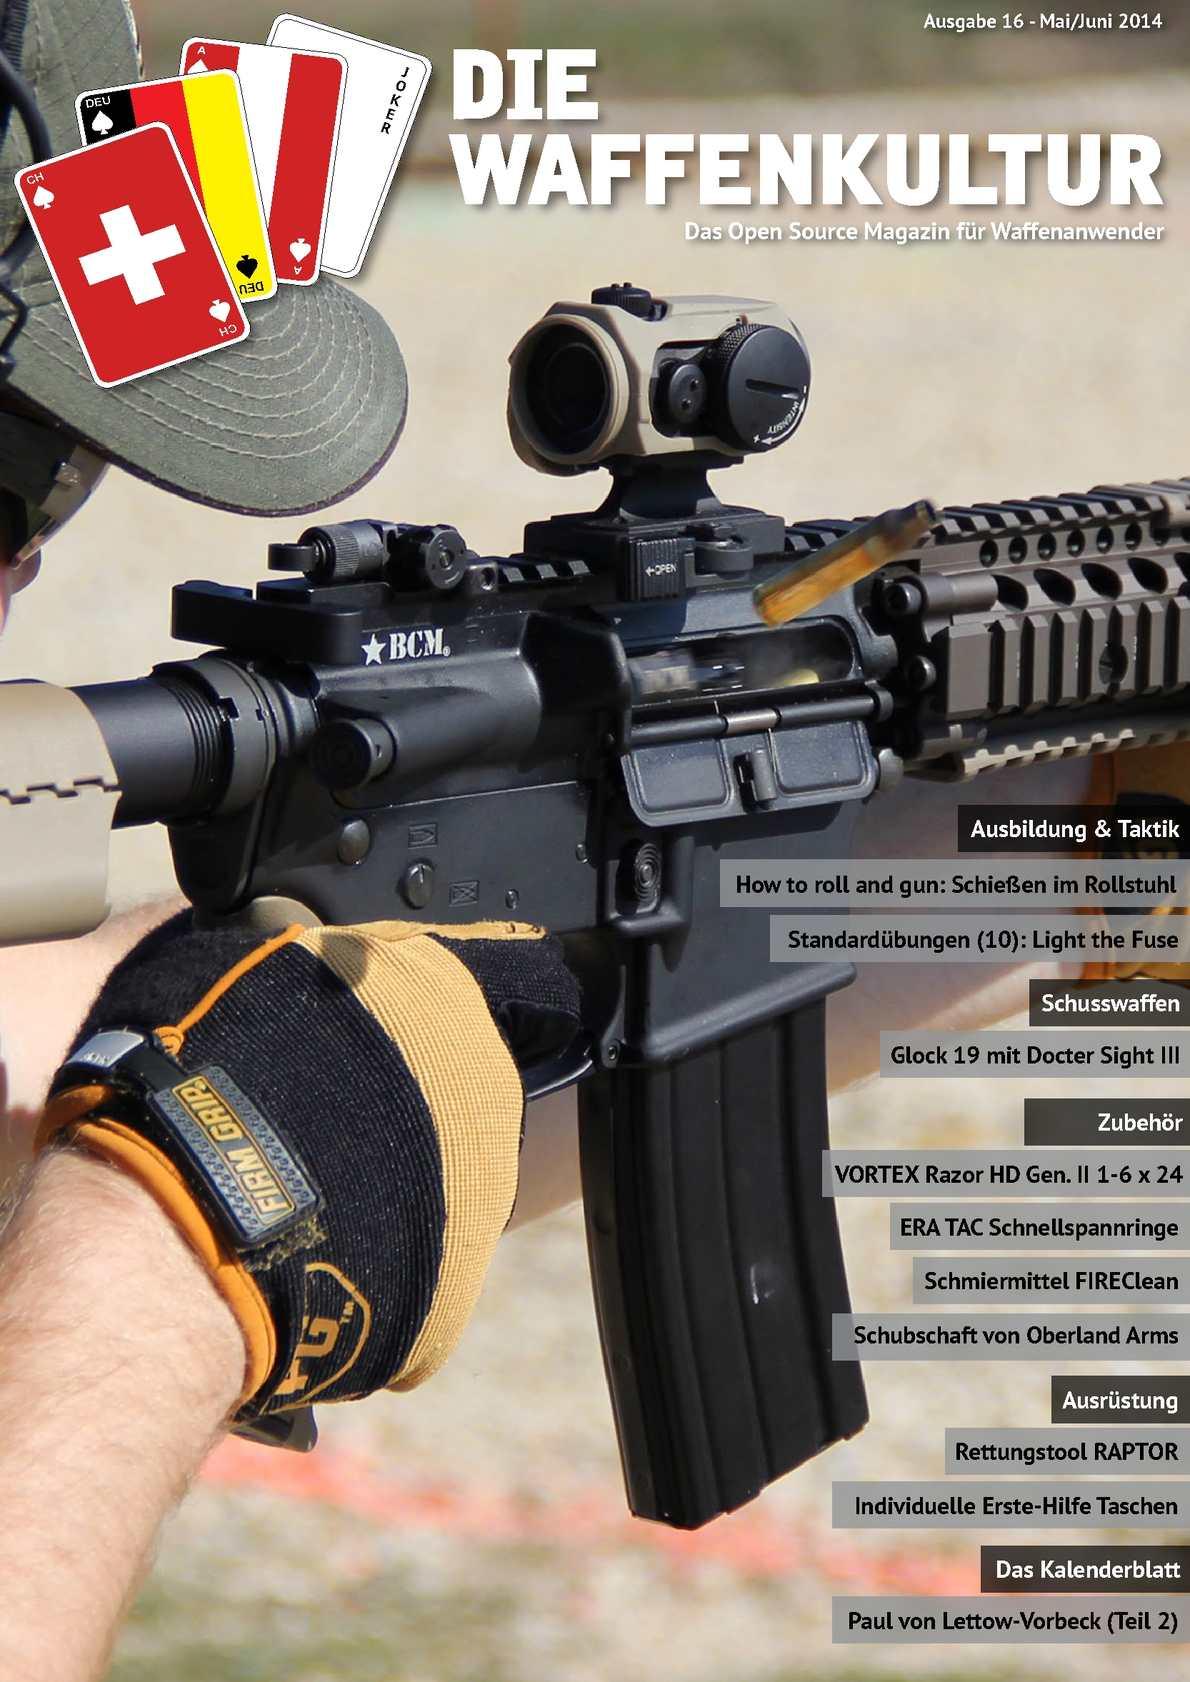 Die Waffenkultur - Ausgabe 16 - Mai / Juni